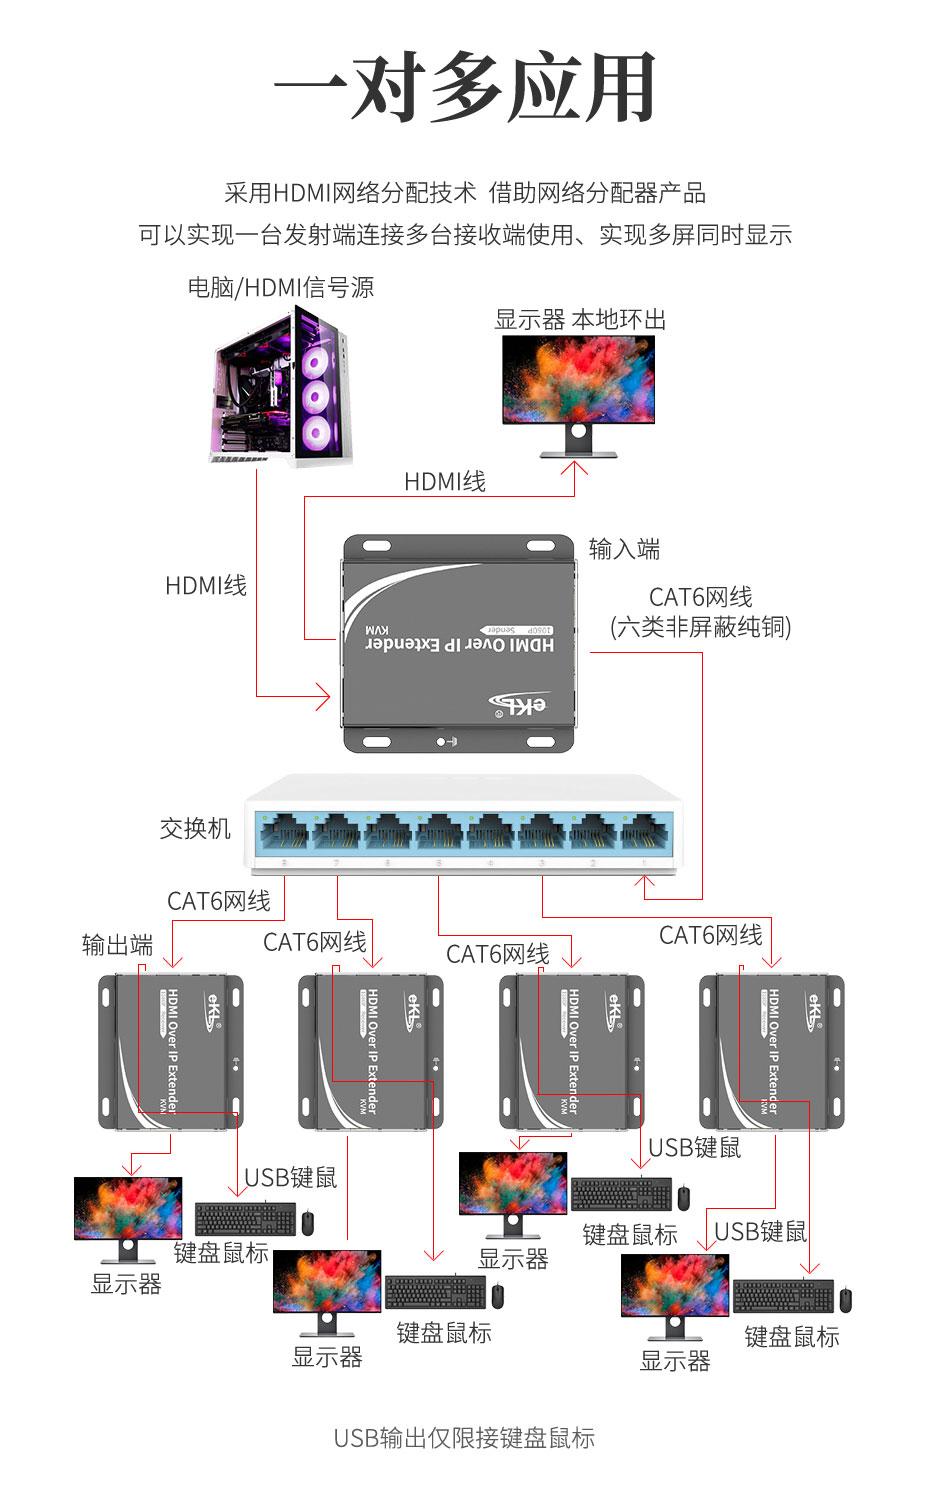 HDMI KVM延长器HU150 1对多连接使用示意图